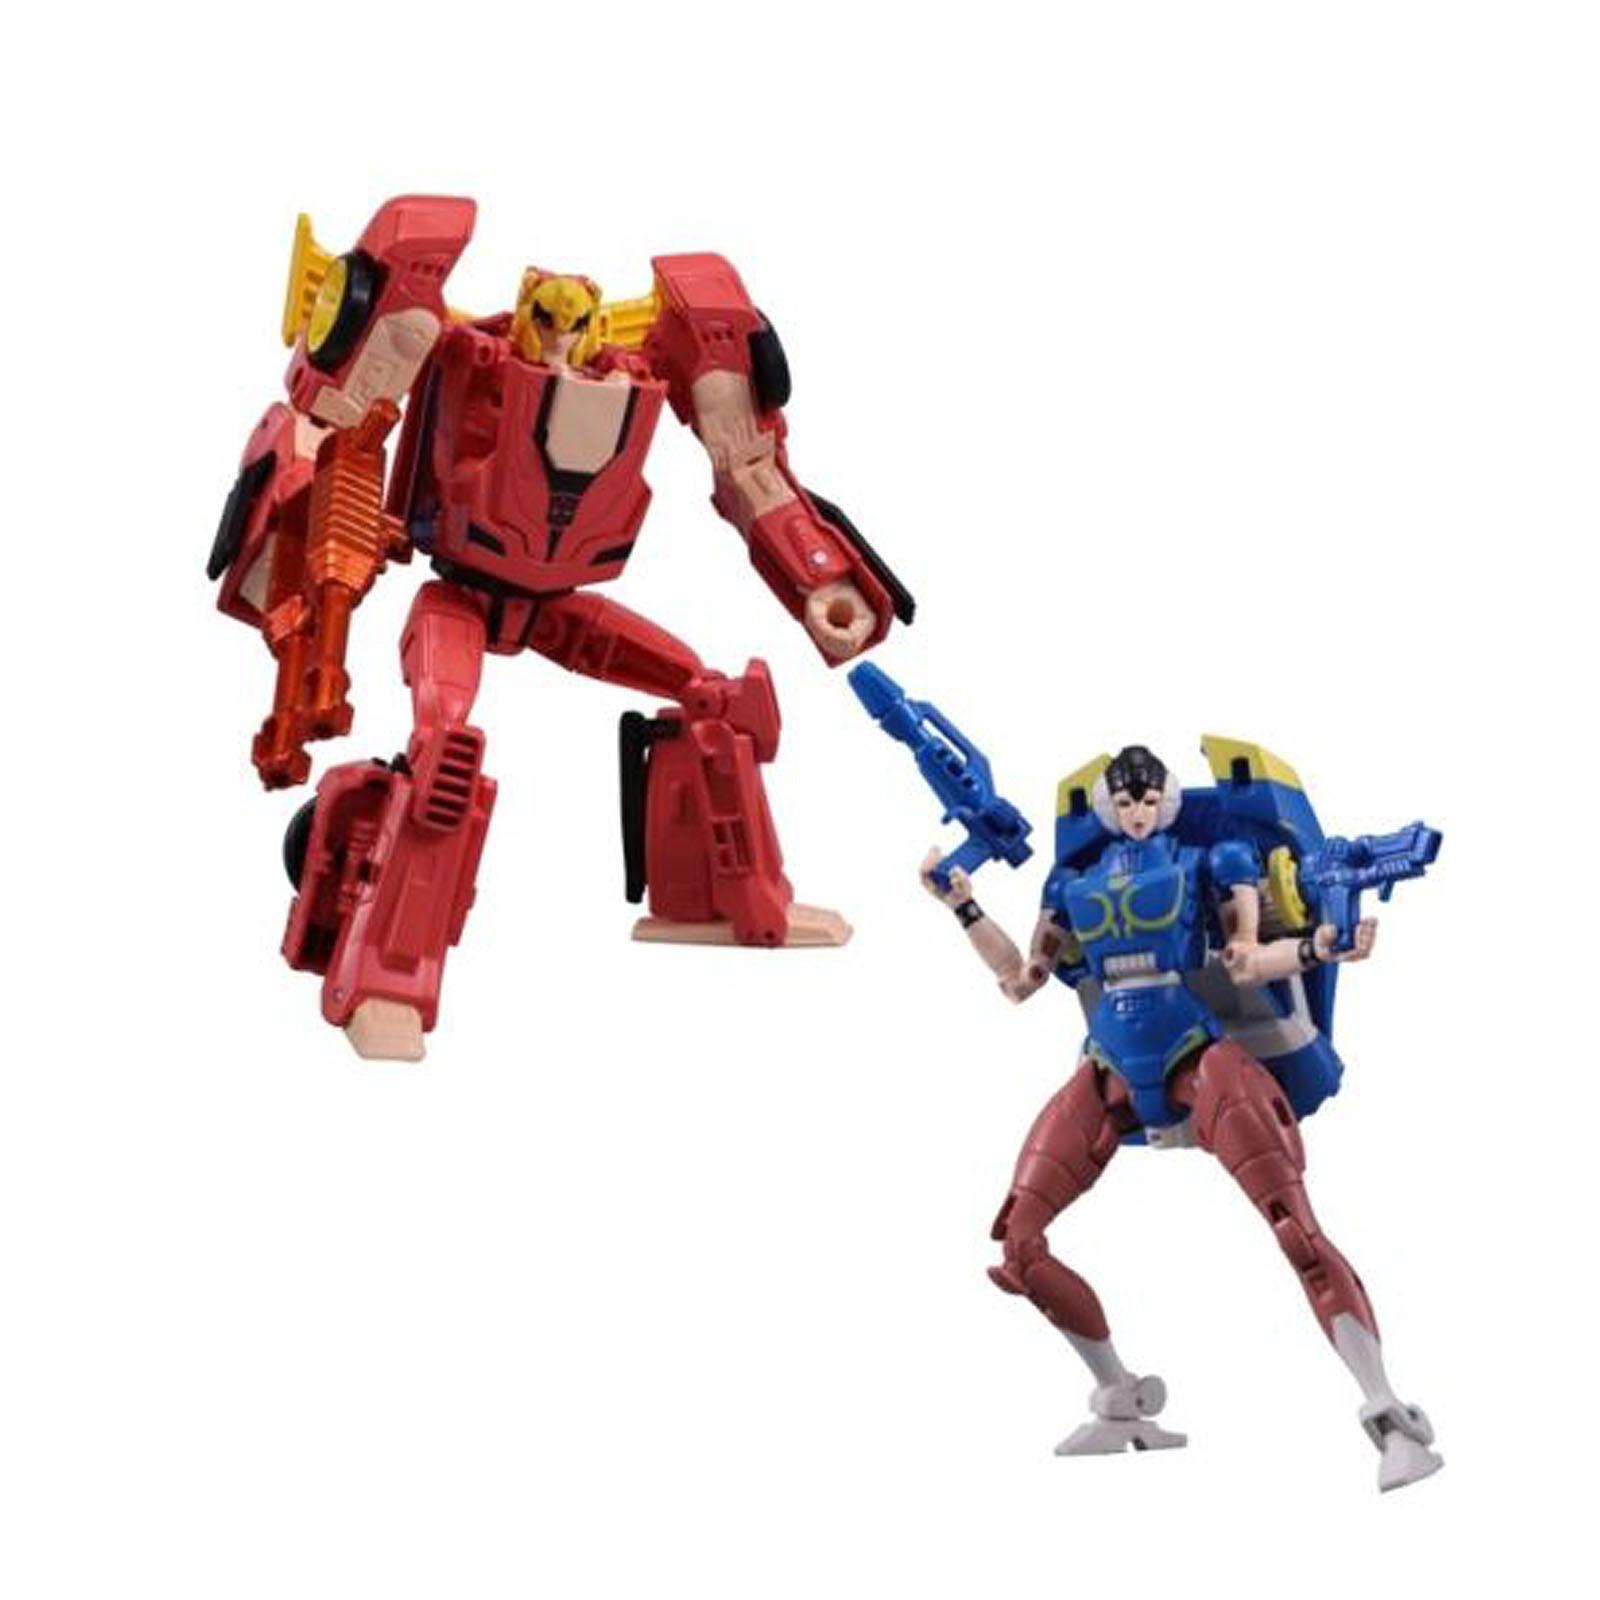 Transformers & Street Fighter 2 2 2 HOT RODIMUS Ken vs ARCEE ChunLi Collection Toys 913517